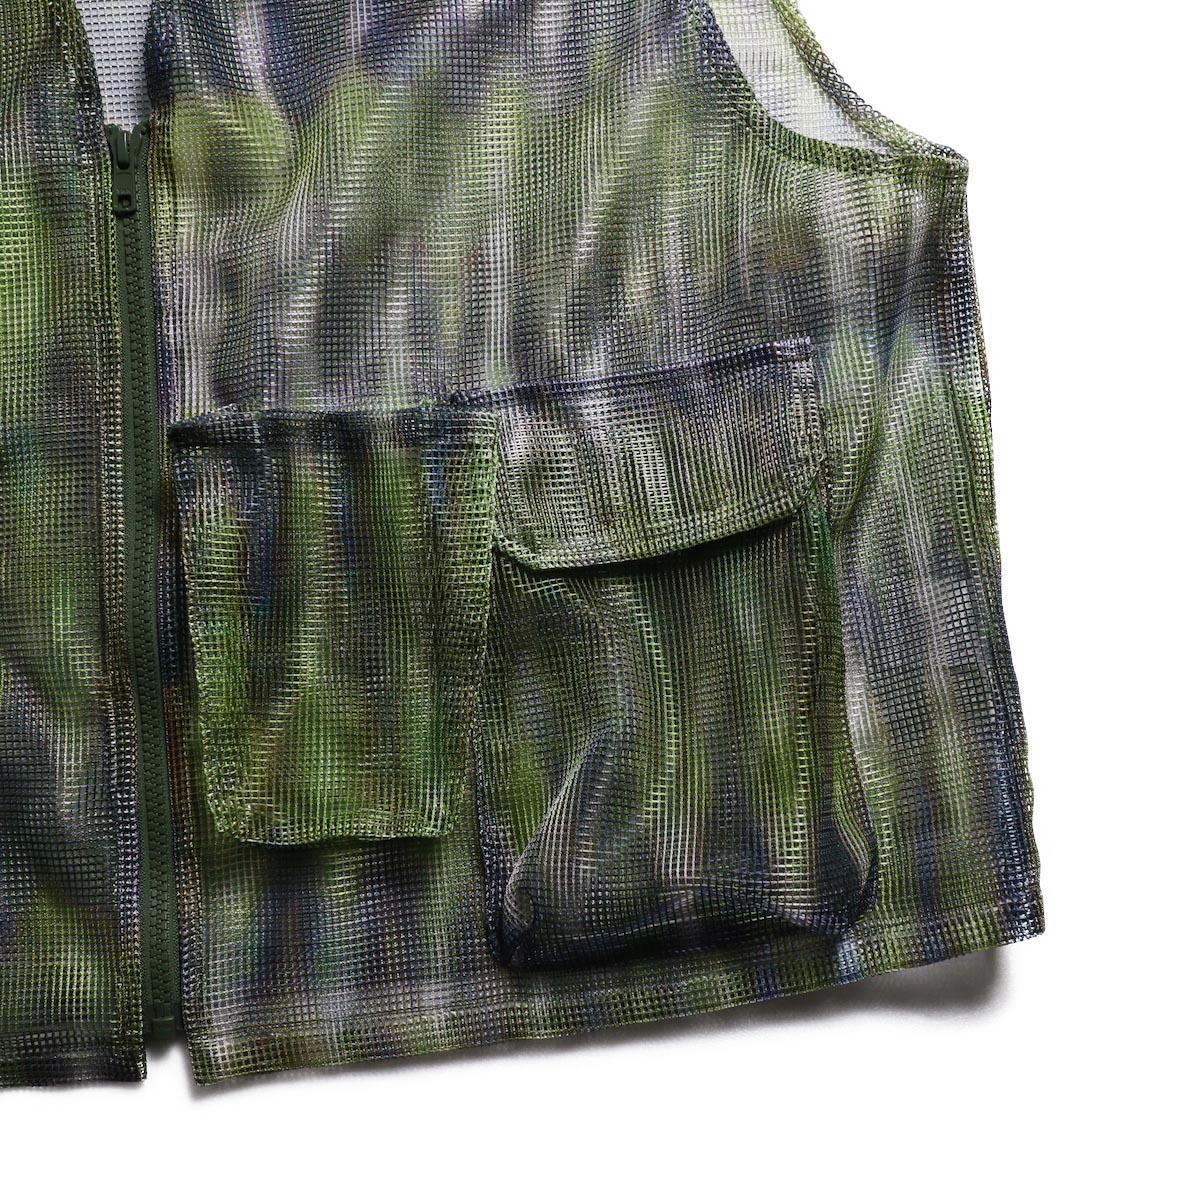 SOUTH2 WEST8 / Mesh Bush Vest -Poly Mesh (Tie Dye) 左